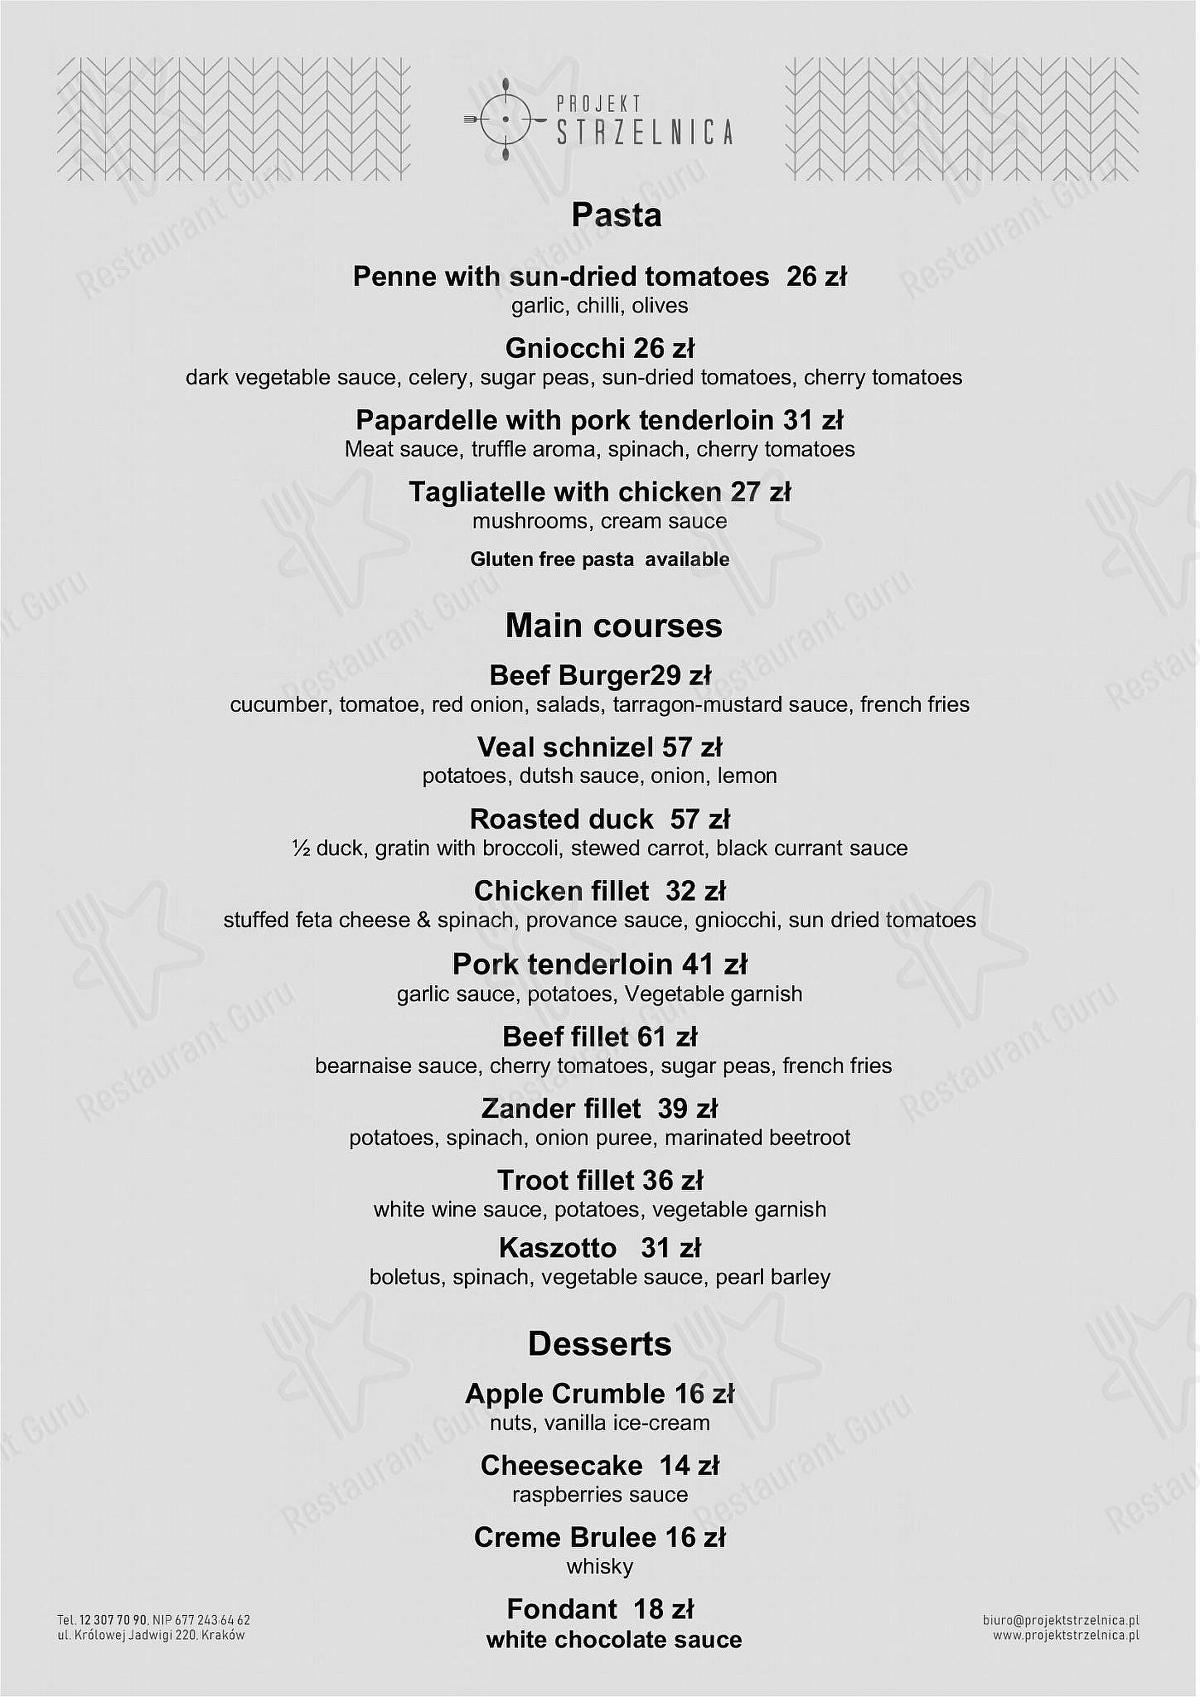 Menu Food for the Projekt Strzelnica restaurant